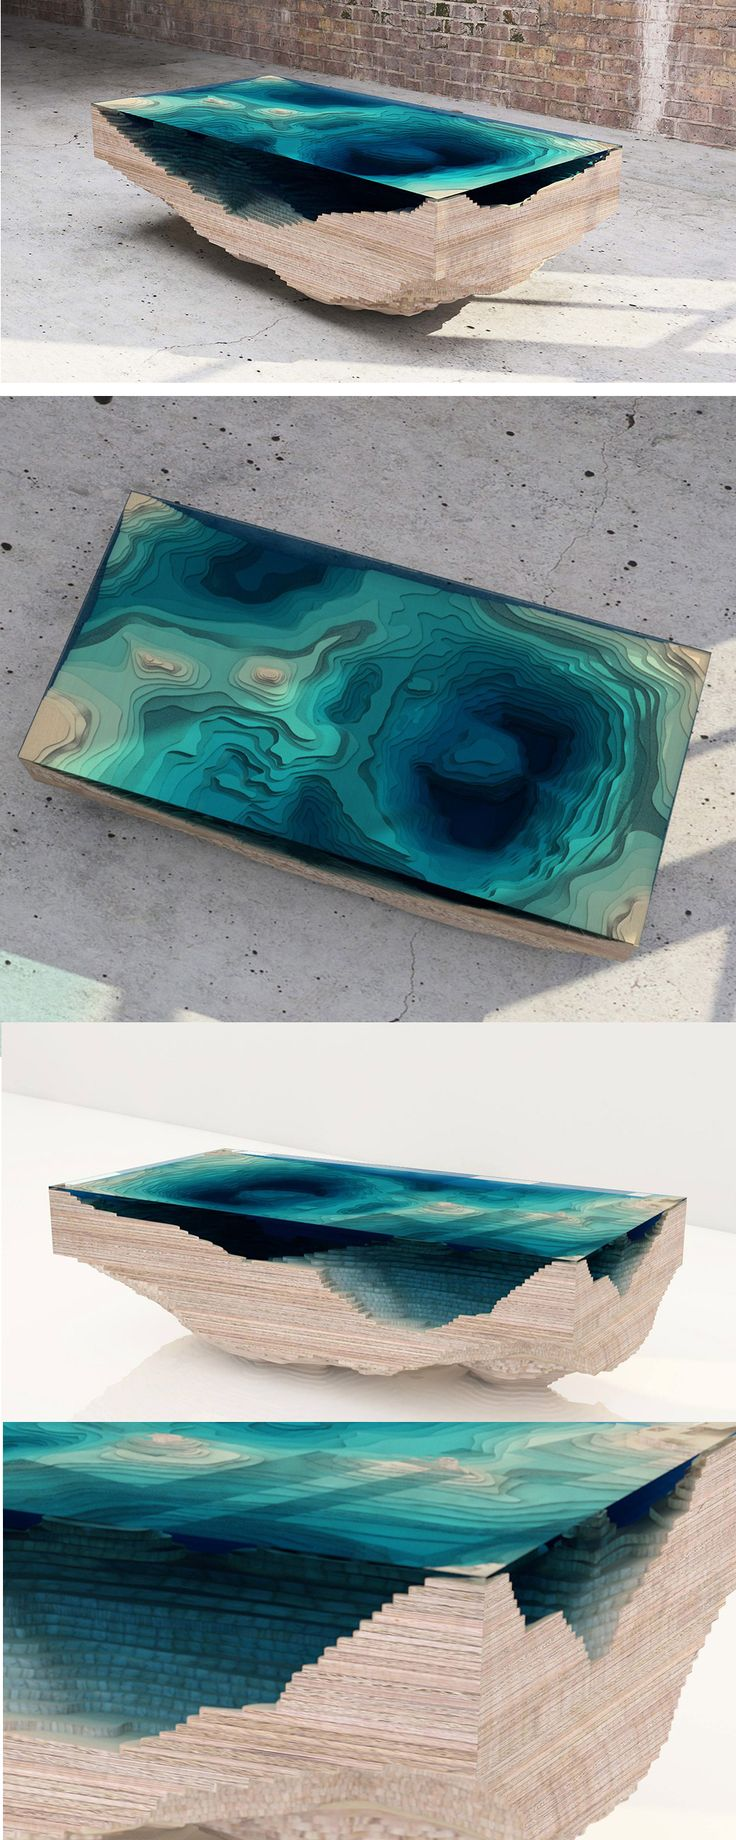 Arcylic and wood, lagoon table.